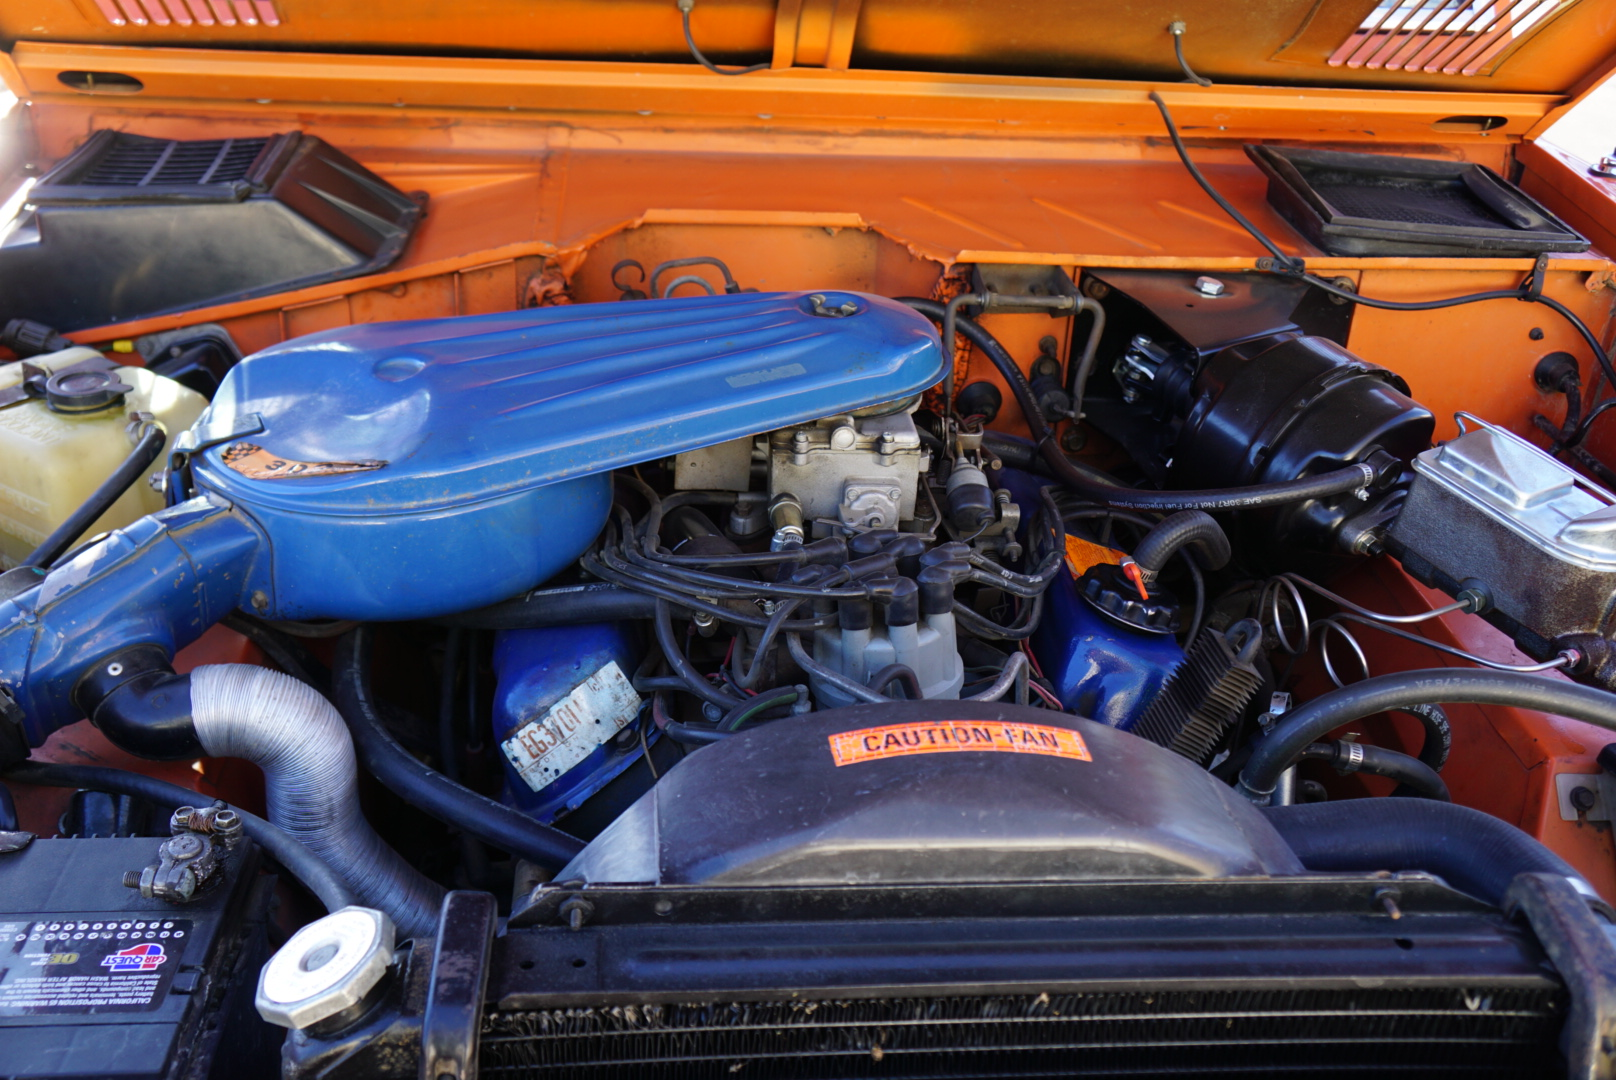 1974 Ford Bronco engine